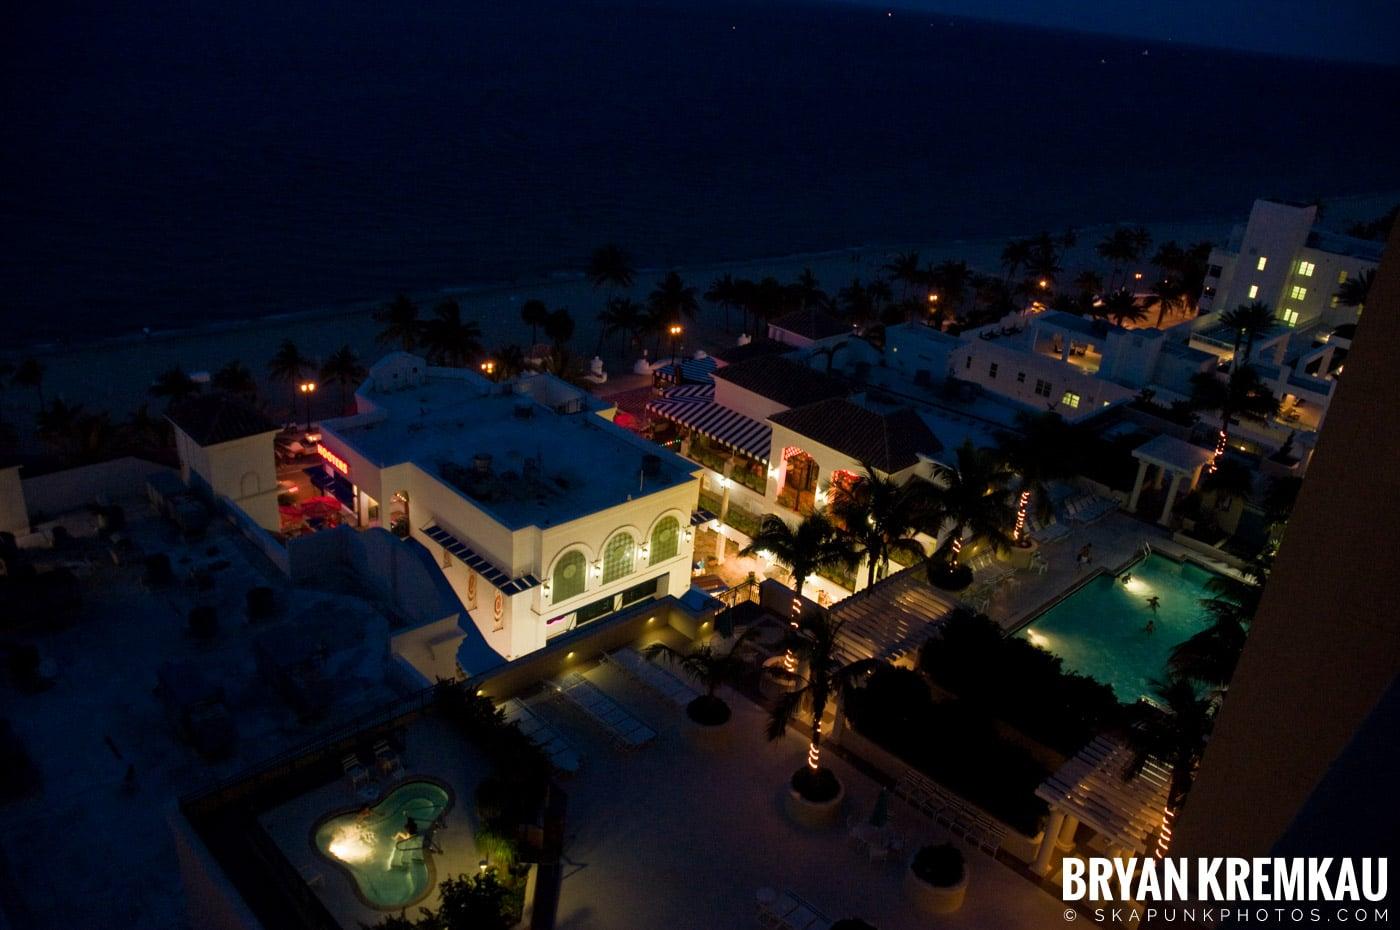 Florida Keys Vacation - 7.09.10 - 7.15.10 (91)